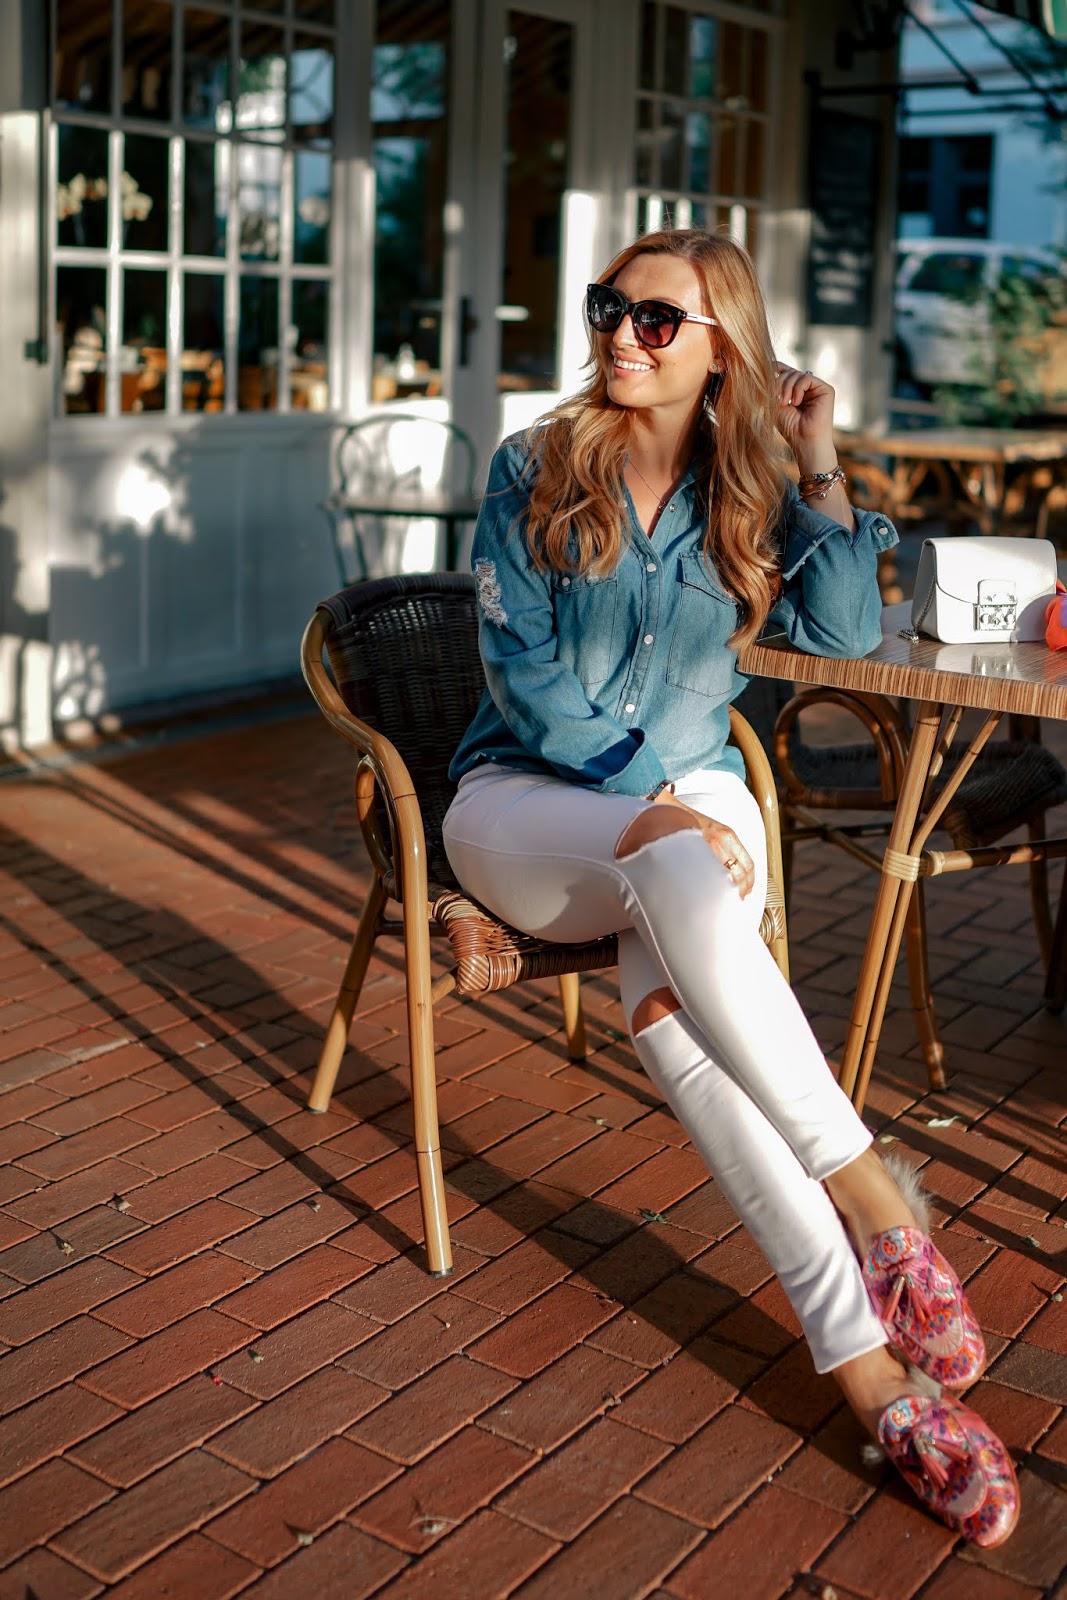 Slipper-Outfitinspiration-Herbst-Look-Jeansbluse-weiße-jeans-pantoletten-melvin-Hamiltion-fashionstylebyjoahanna-fashionblogger-aus-deutschland